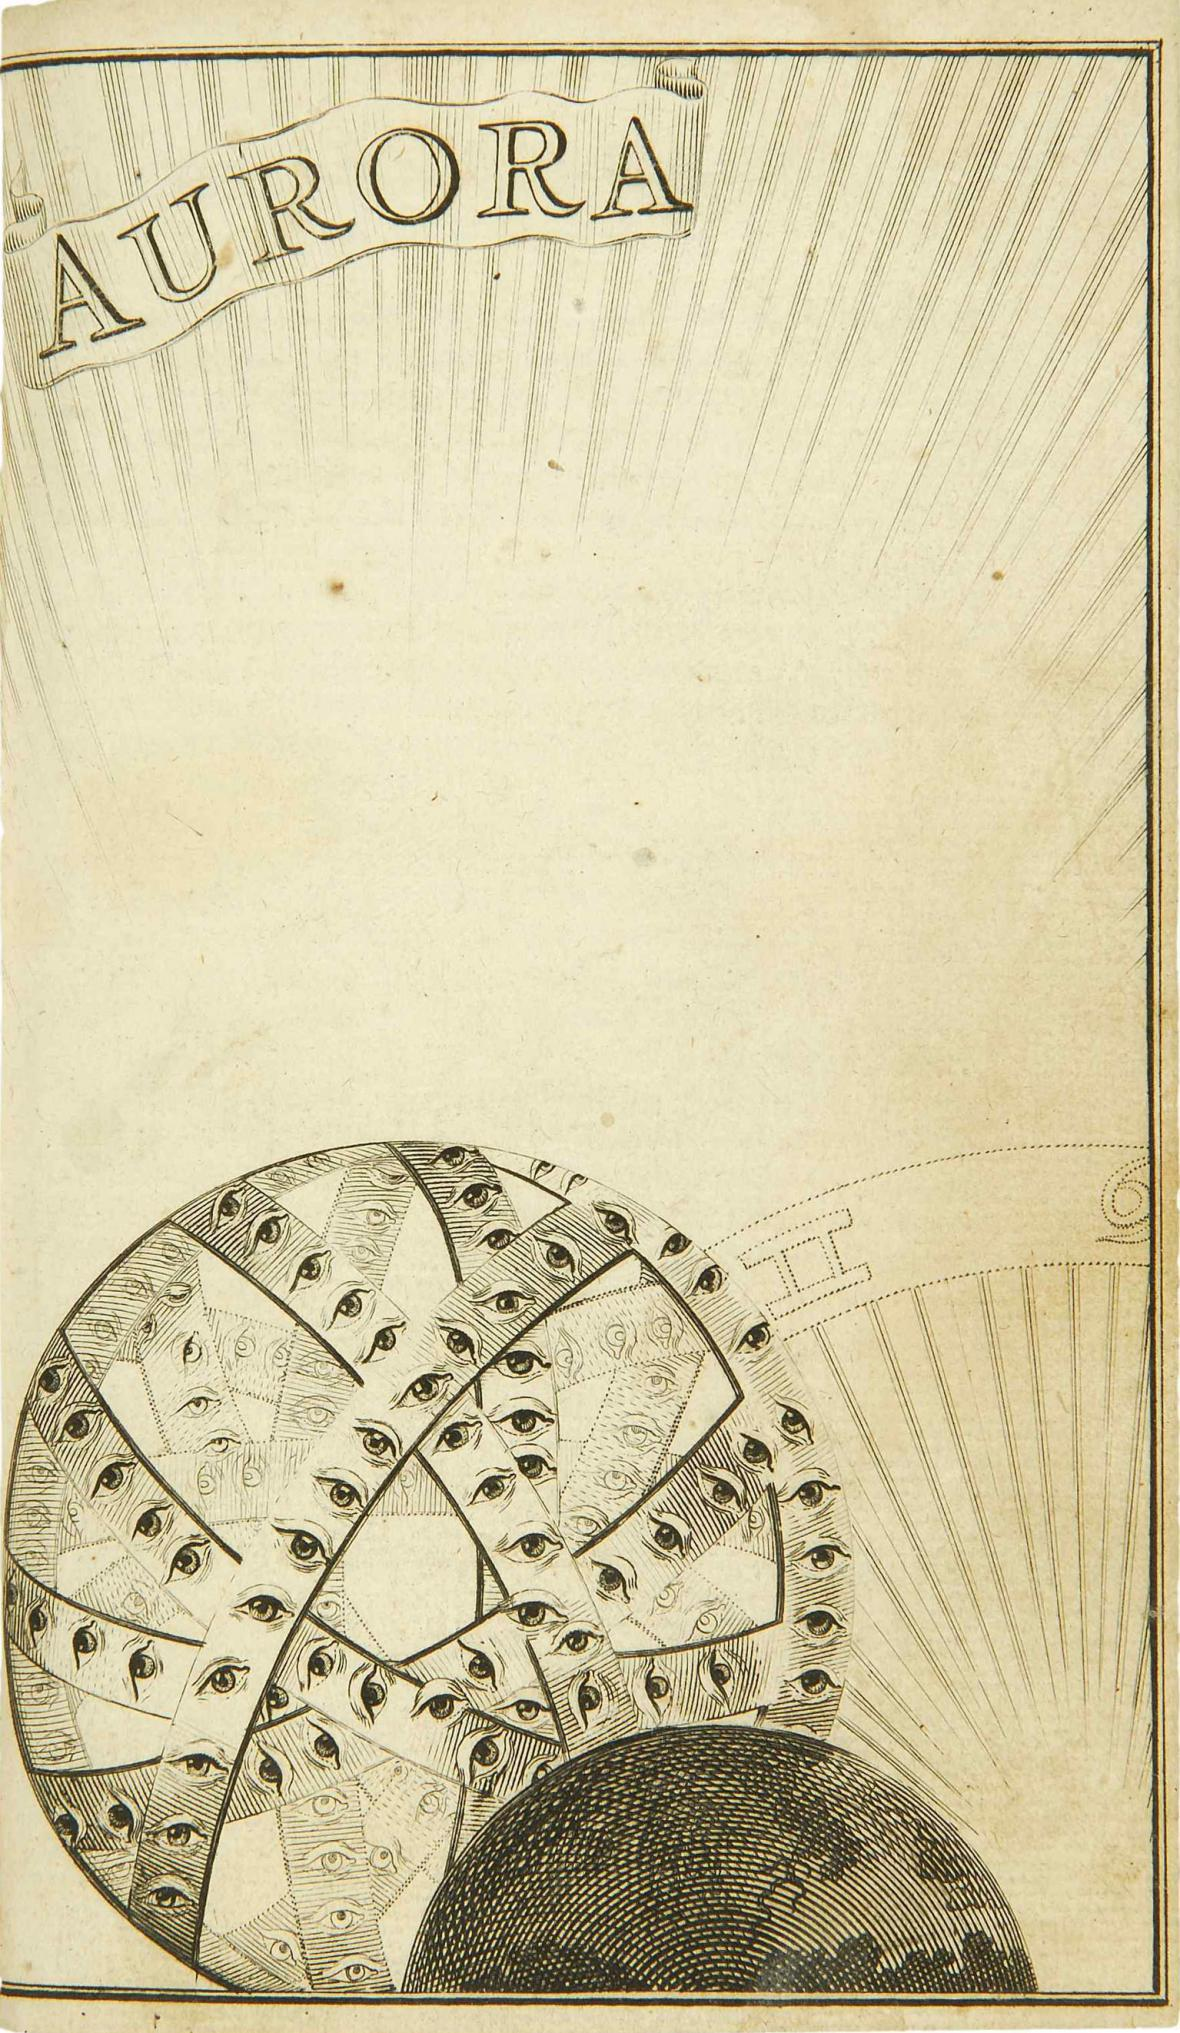 Titulní mědirytina ke spisu Aurora, 1682